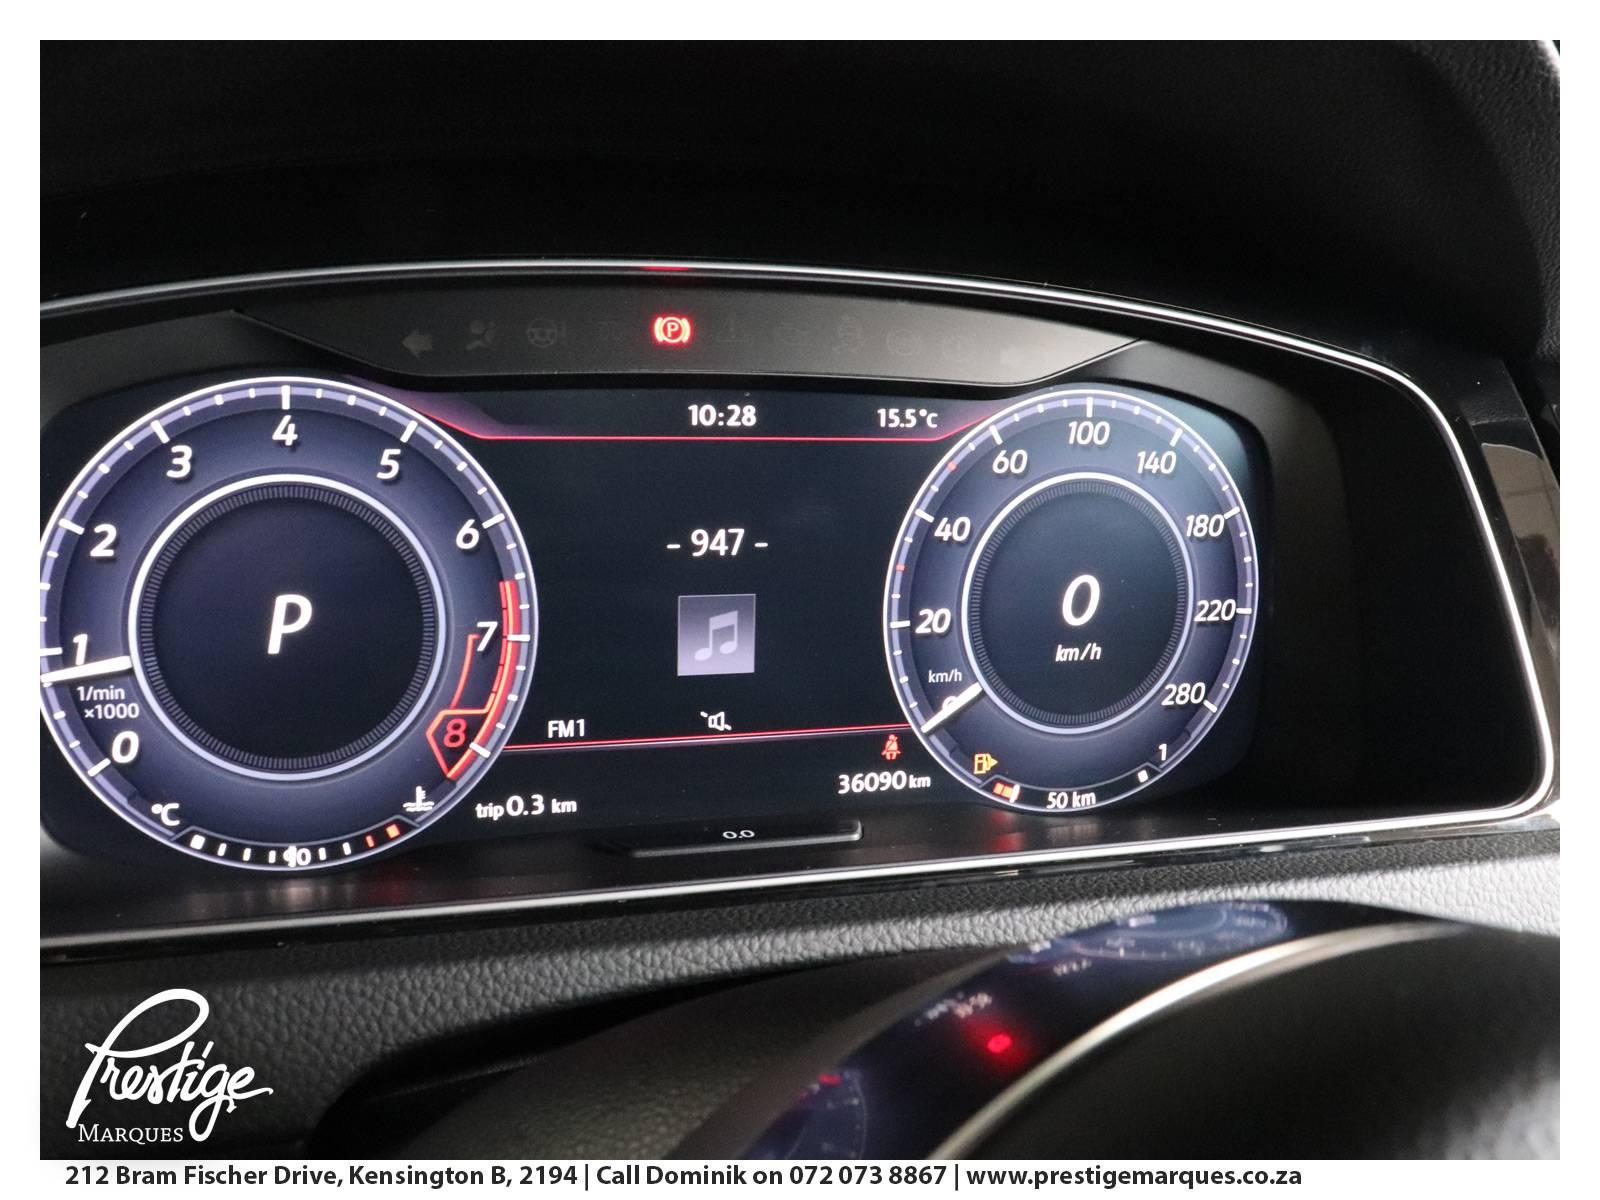 2017-Volkswagen-Golf-GTI-DSG-Facelift-Prestige-Marques-Randburg-Sandton-12